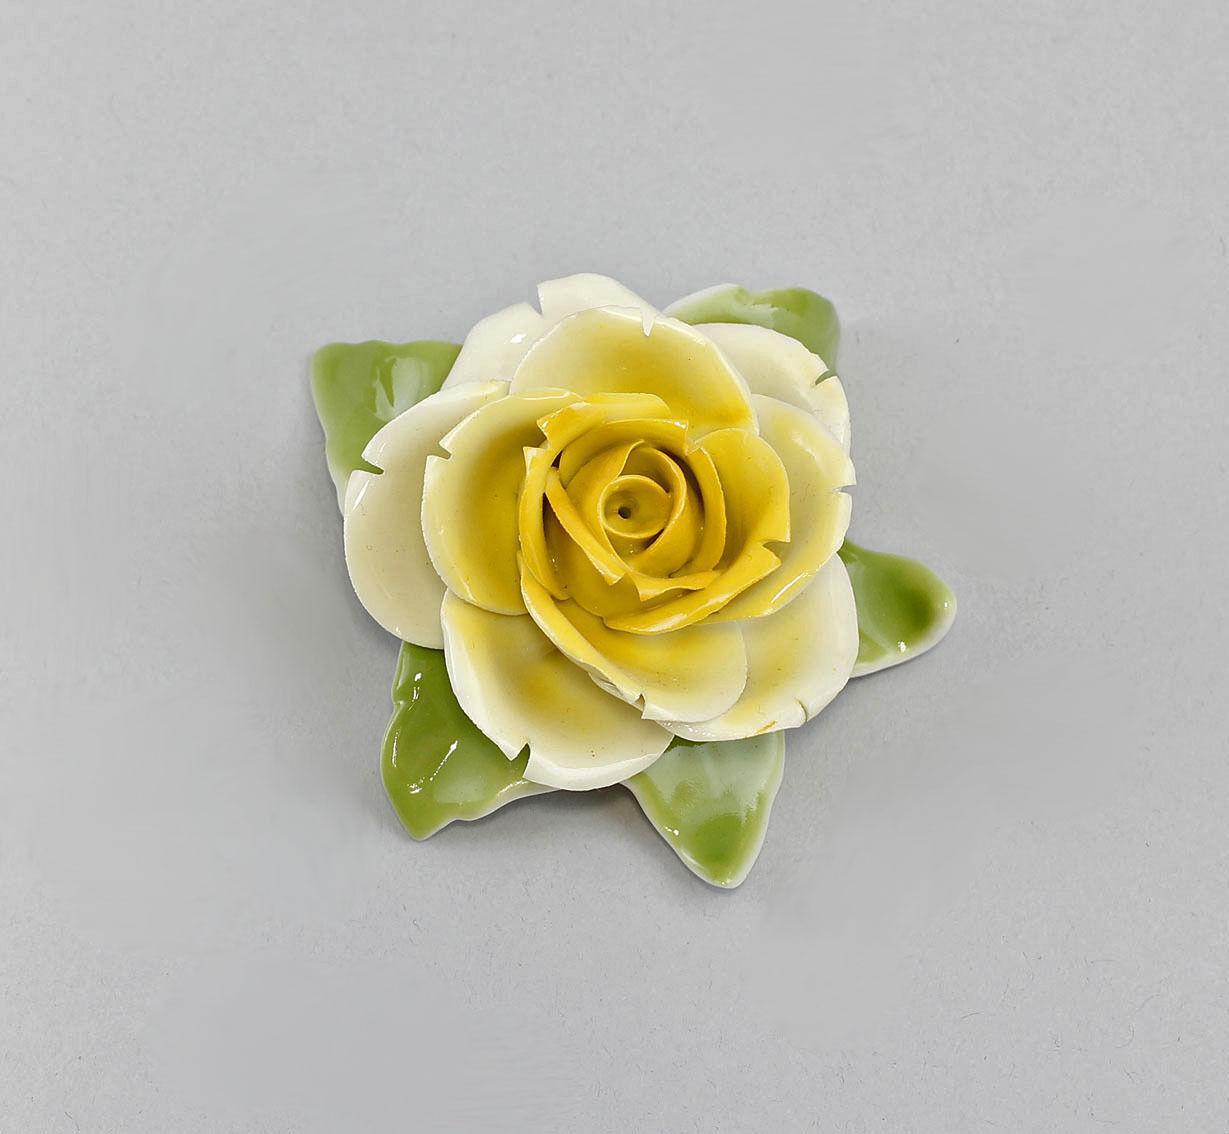 handmade  Table Rose Yellow Kämmer-Porcelain H4CM a3-44132